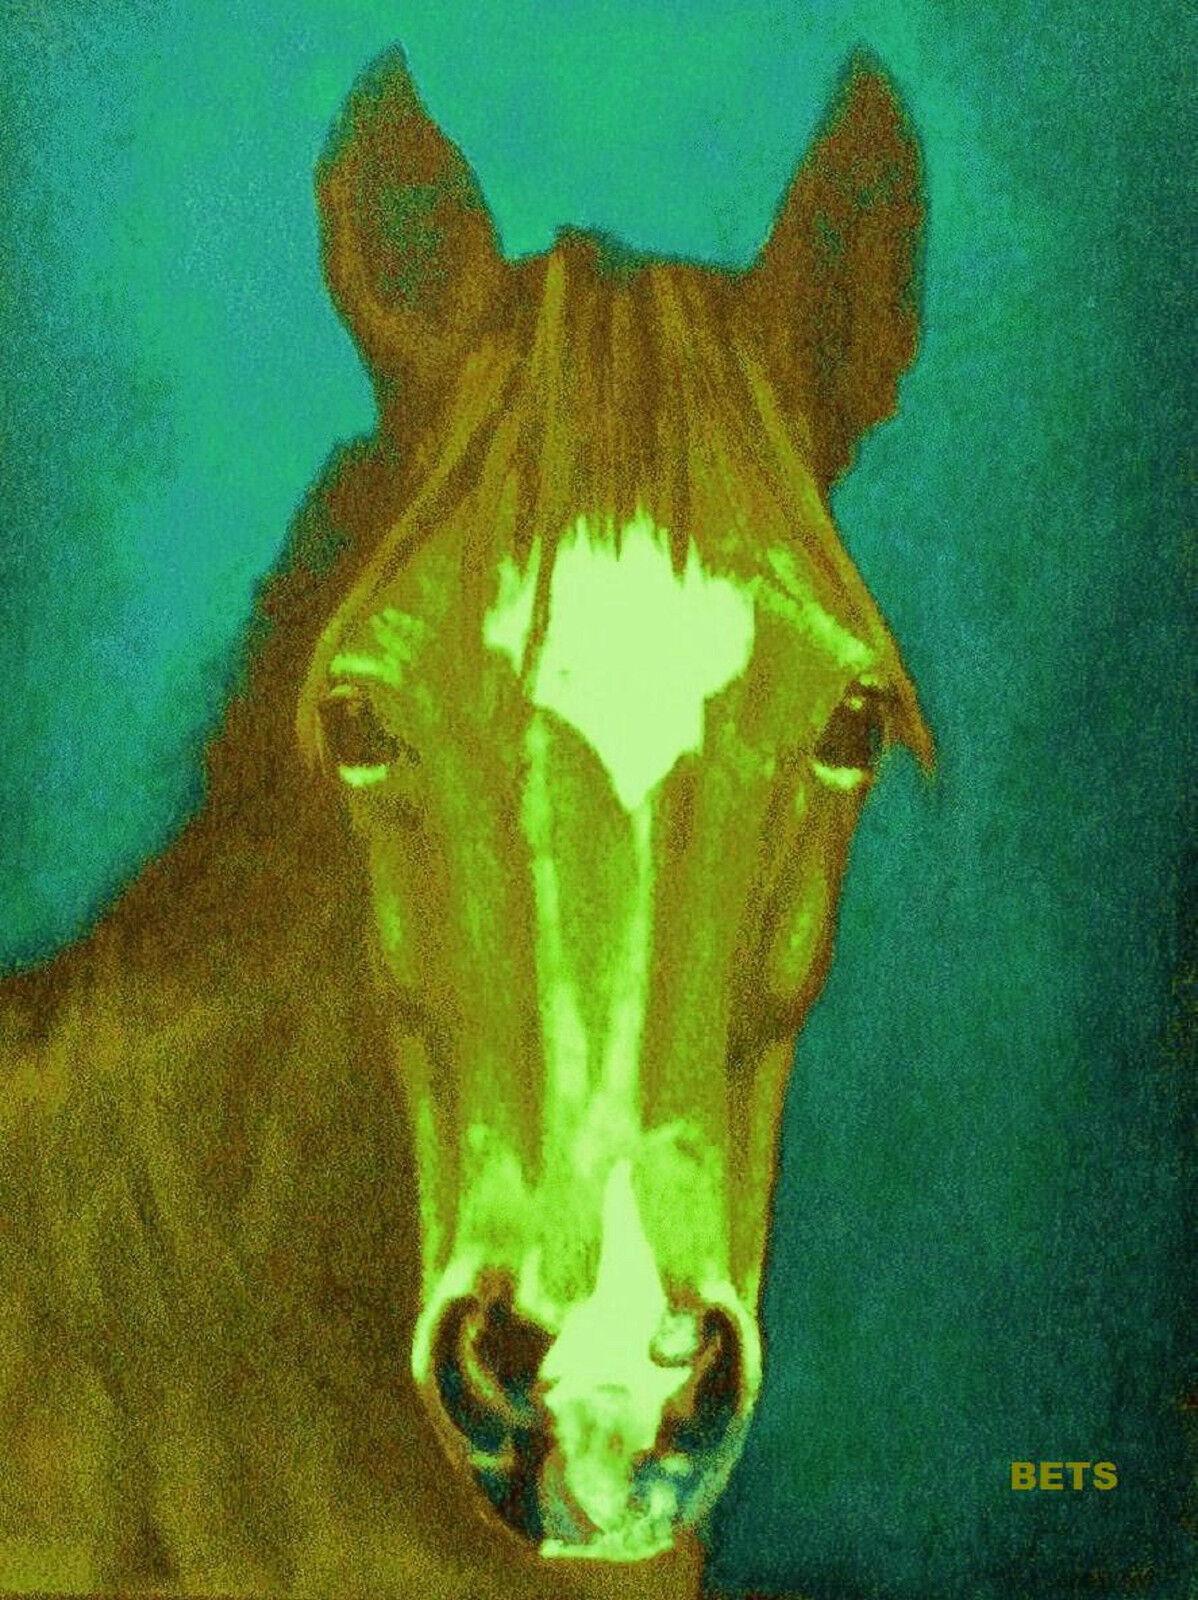 PONY PRINT Giclee MI AMORE AMORE MI artist BETS 7 COLORS print sze 14 x 19 WOW YOUR WALLS a5341b